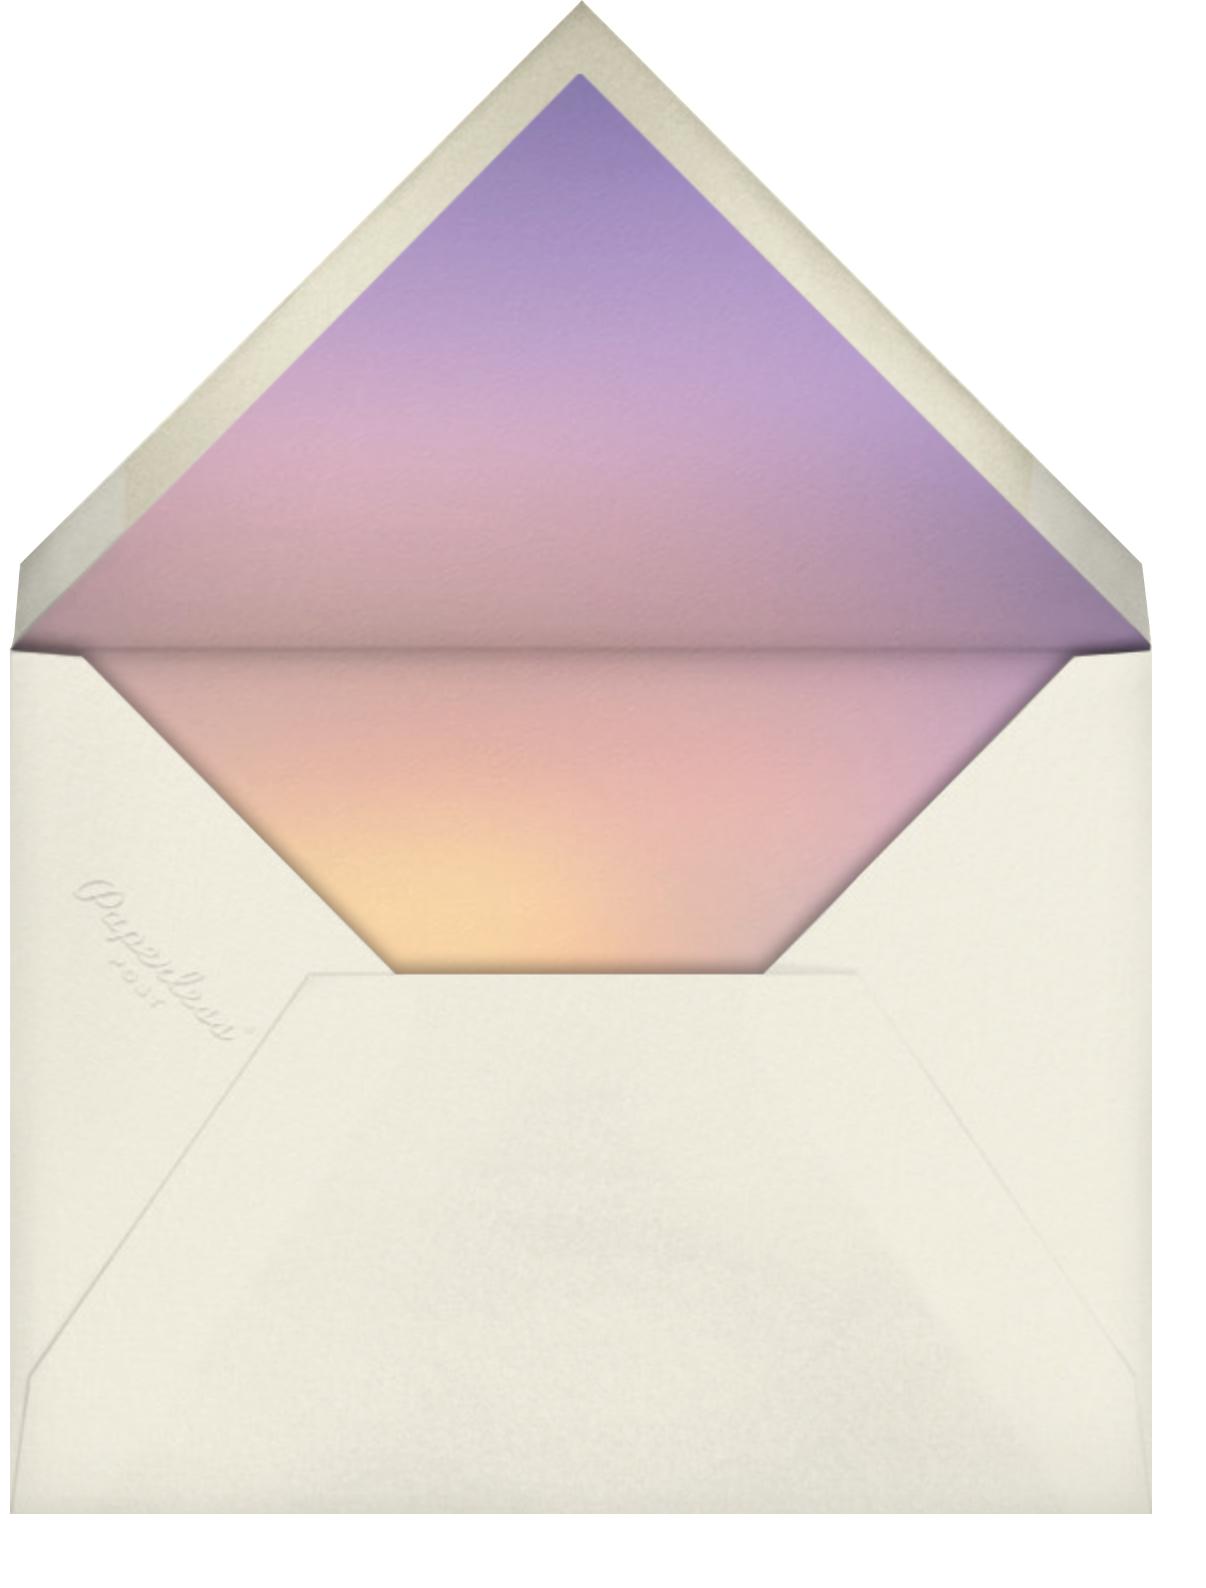 Glowing Sky - Vashti Harrison - Envelope